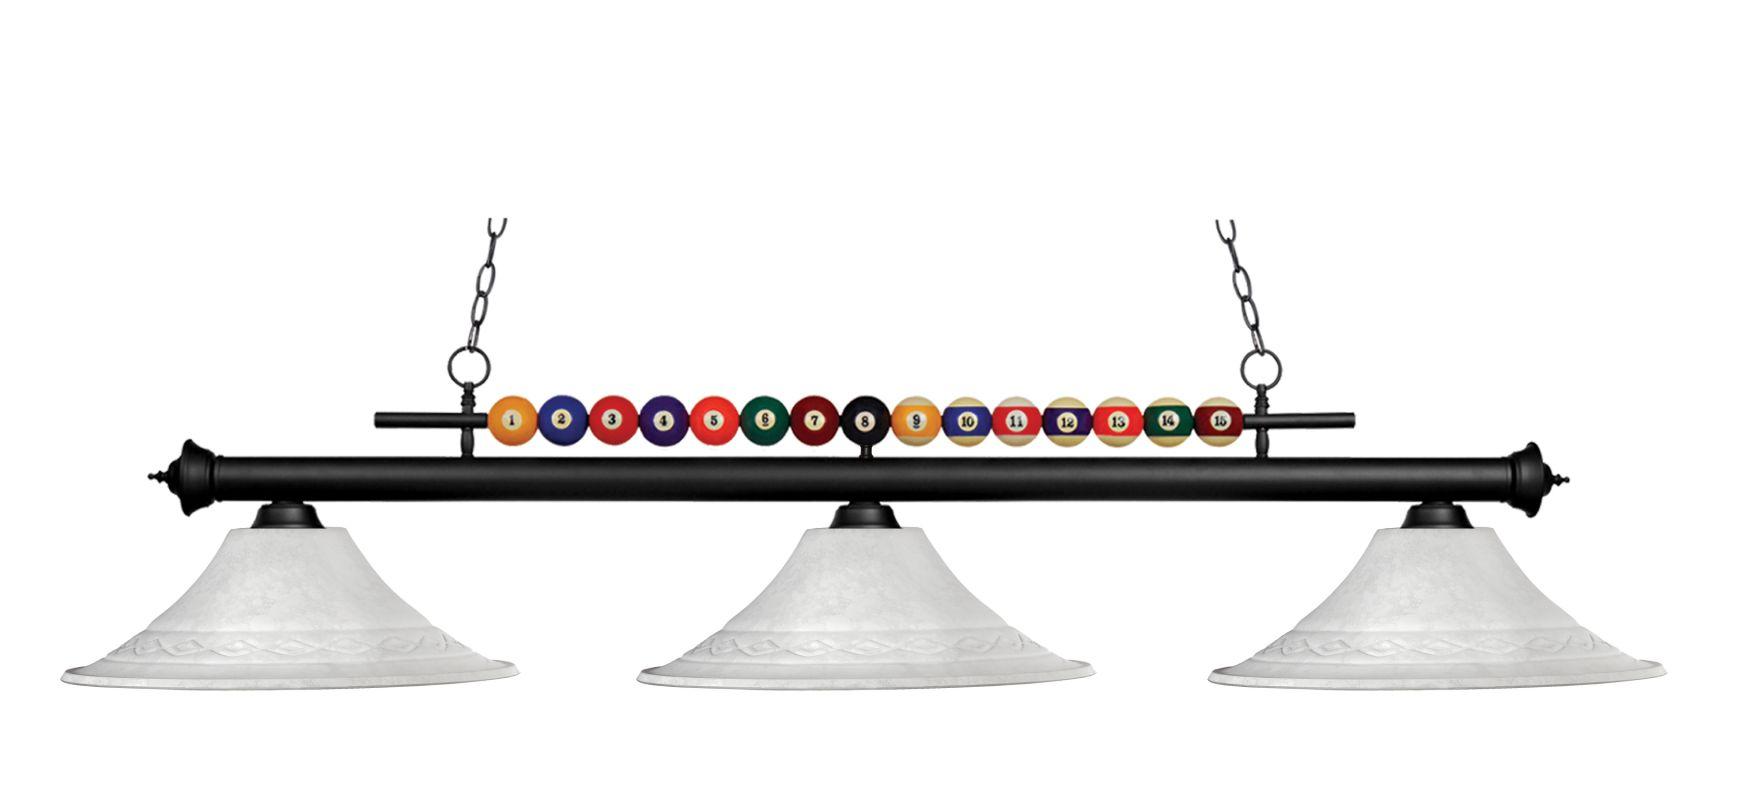 Z-Lite 170-FWM16 Shark 3 Light Chandelier with Glass Shade Matte Black Sale $494.00 ITEM: bci2519237 ID#:170MB-FWM16 UPC: 685659019872 :